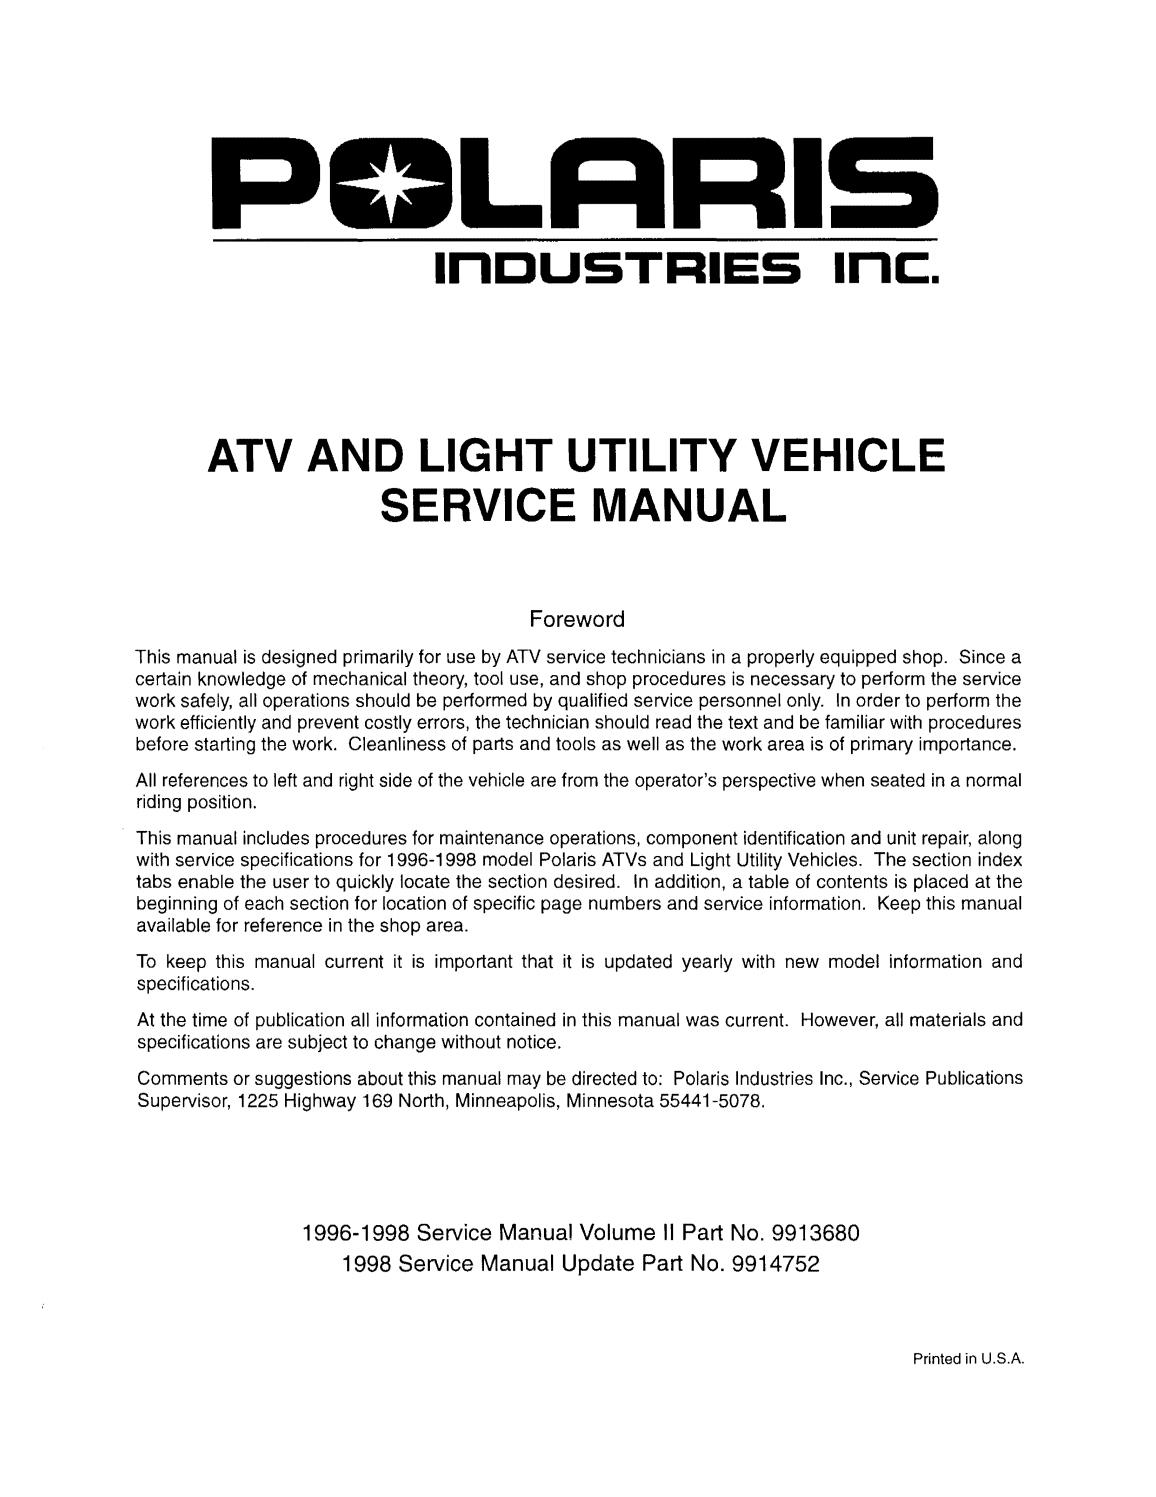 1996 Polaris Sportsman 500 Service Repair Manual By 1631010310 Issuu